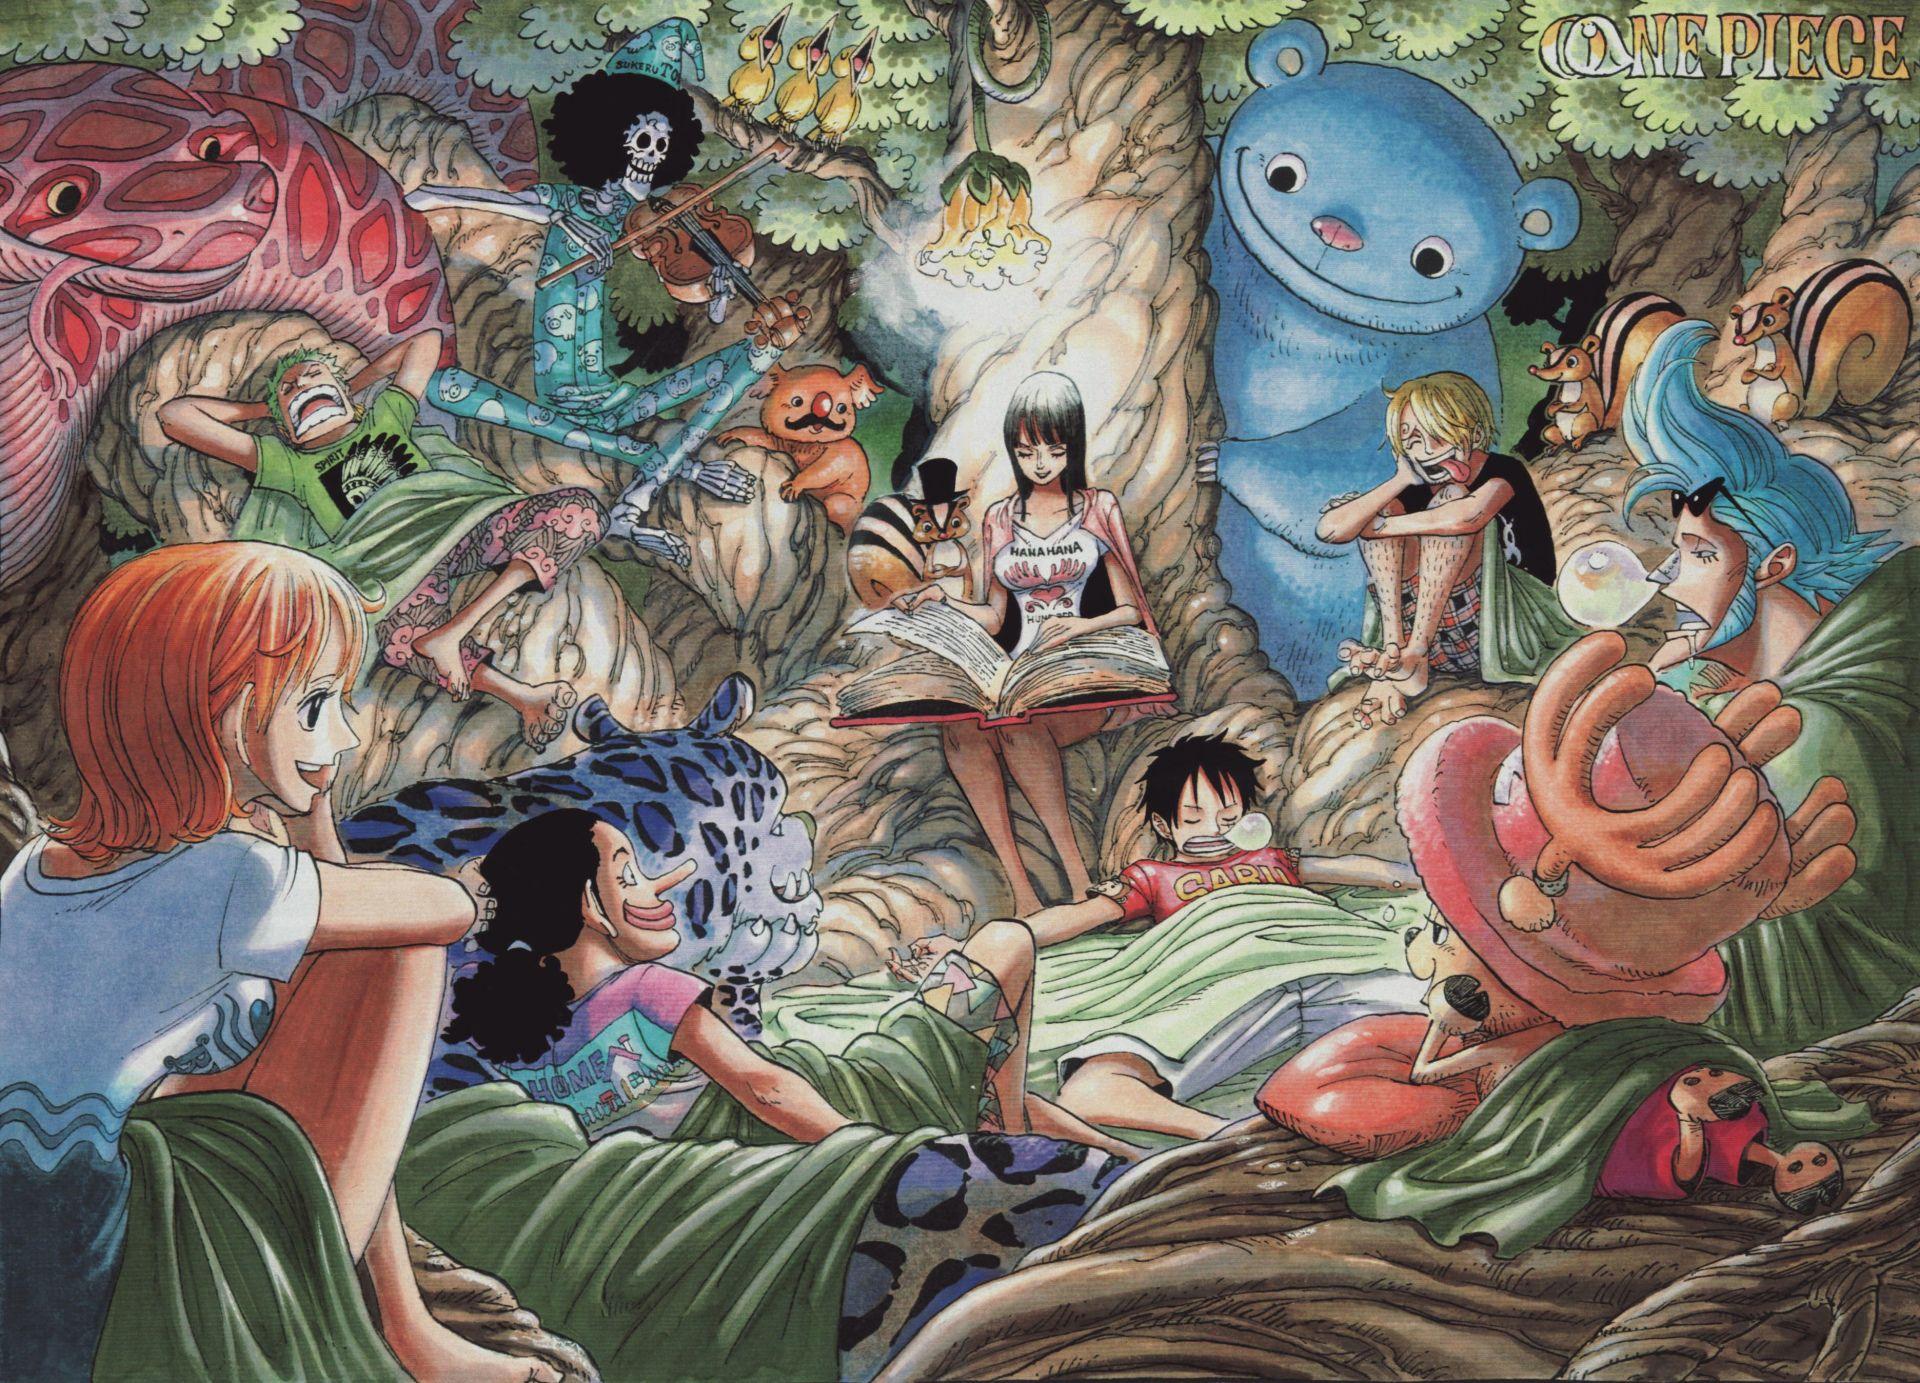 Poster One Piece Luffy Zoro Japan Anime Room Club Wall Cloth Print 17